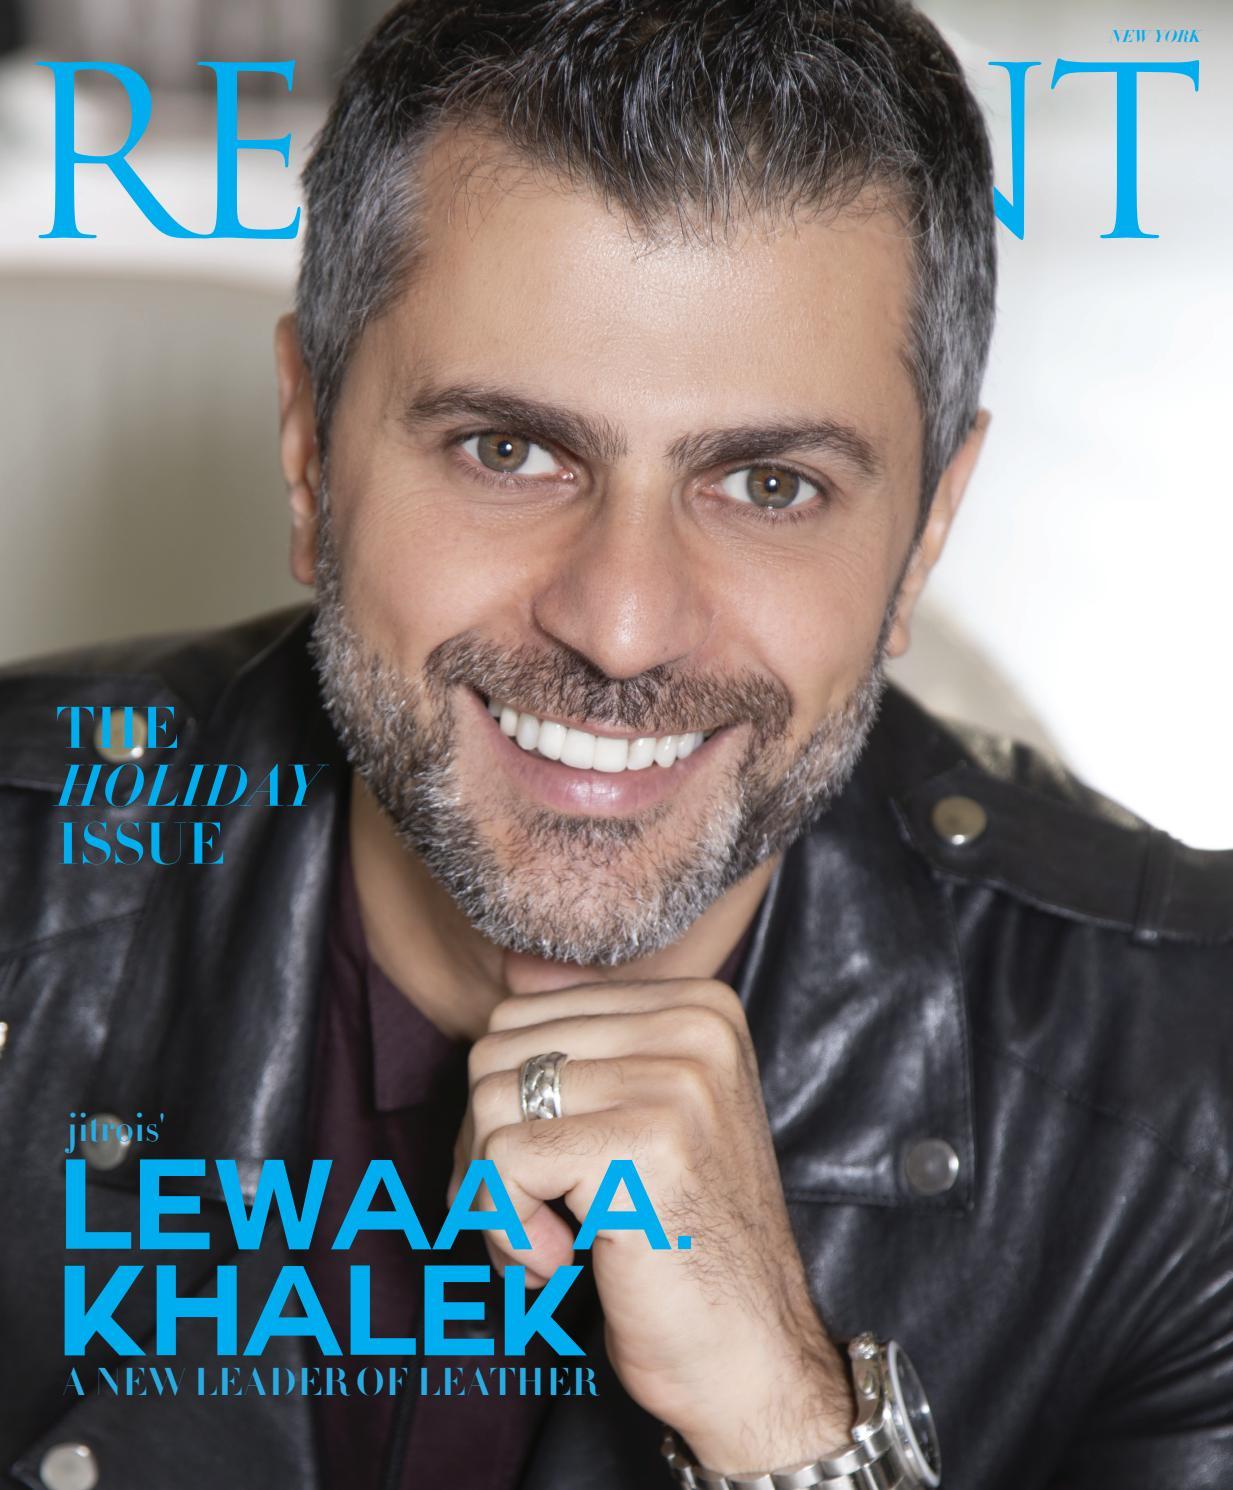 cfe957951d Resident Magazine NY DECEMBER 2018 LEWAA by Resident Magazine - issuu